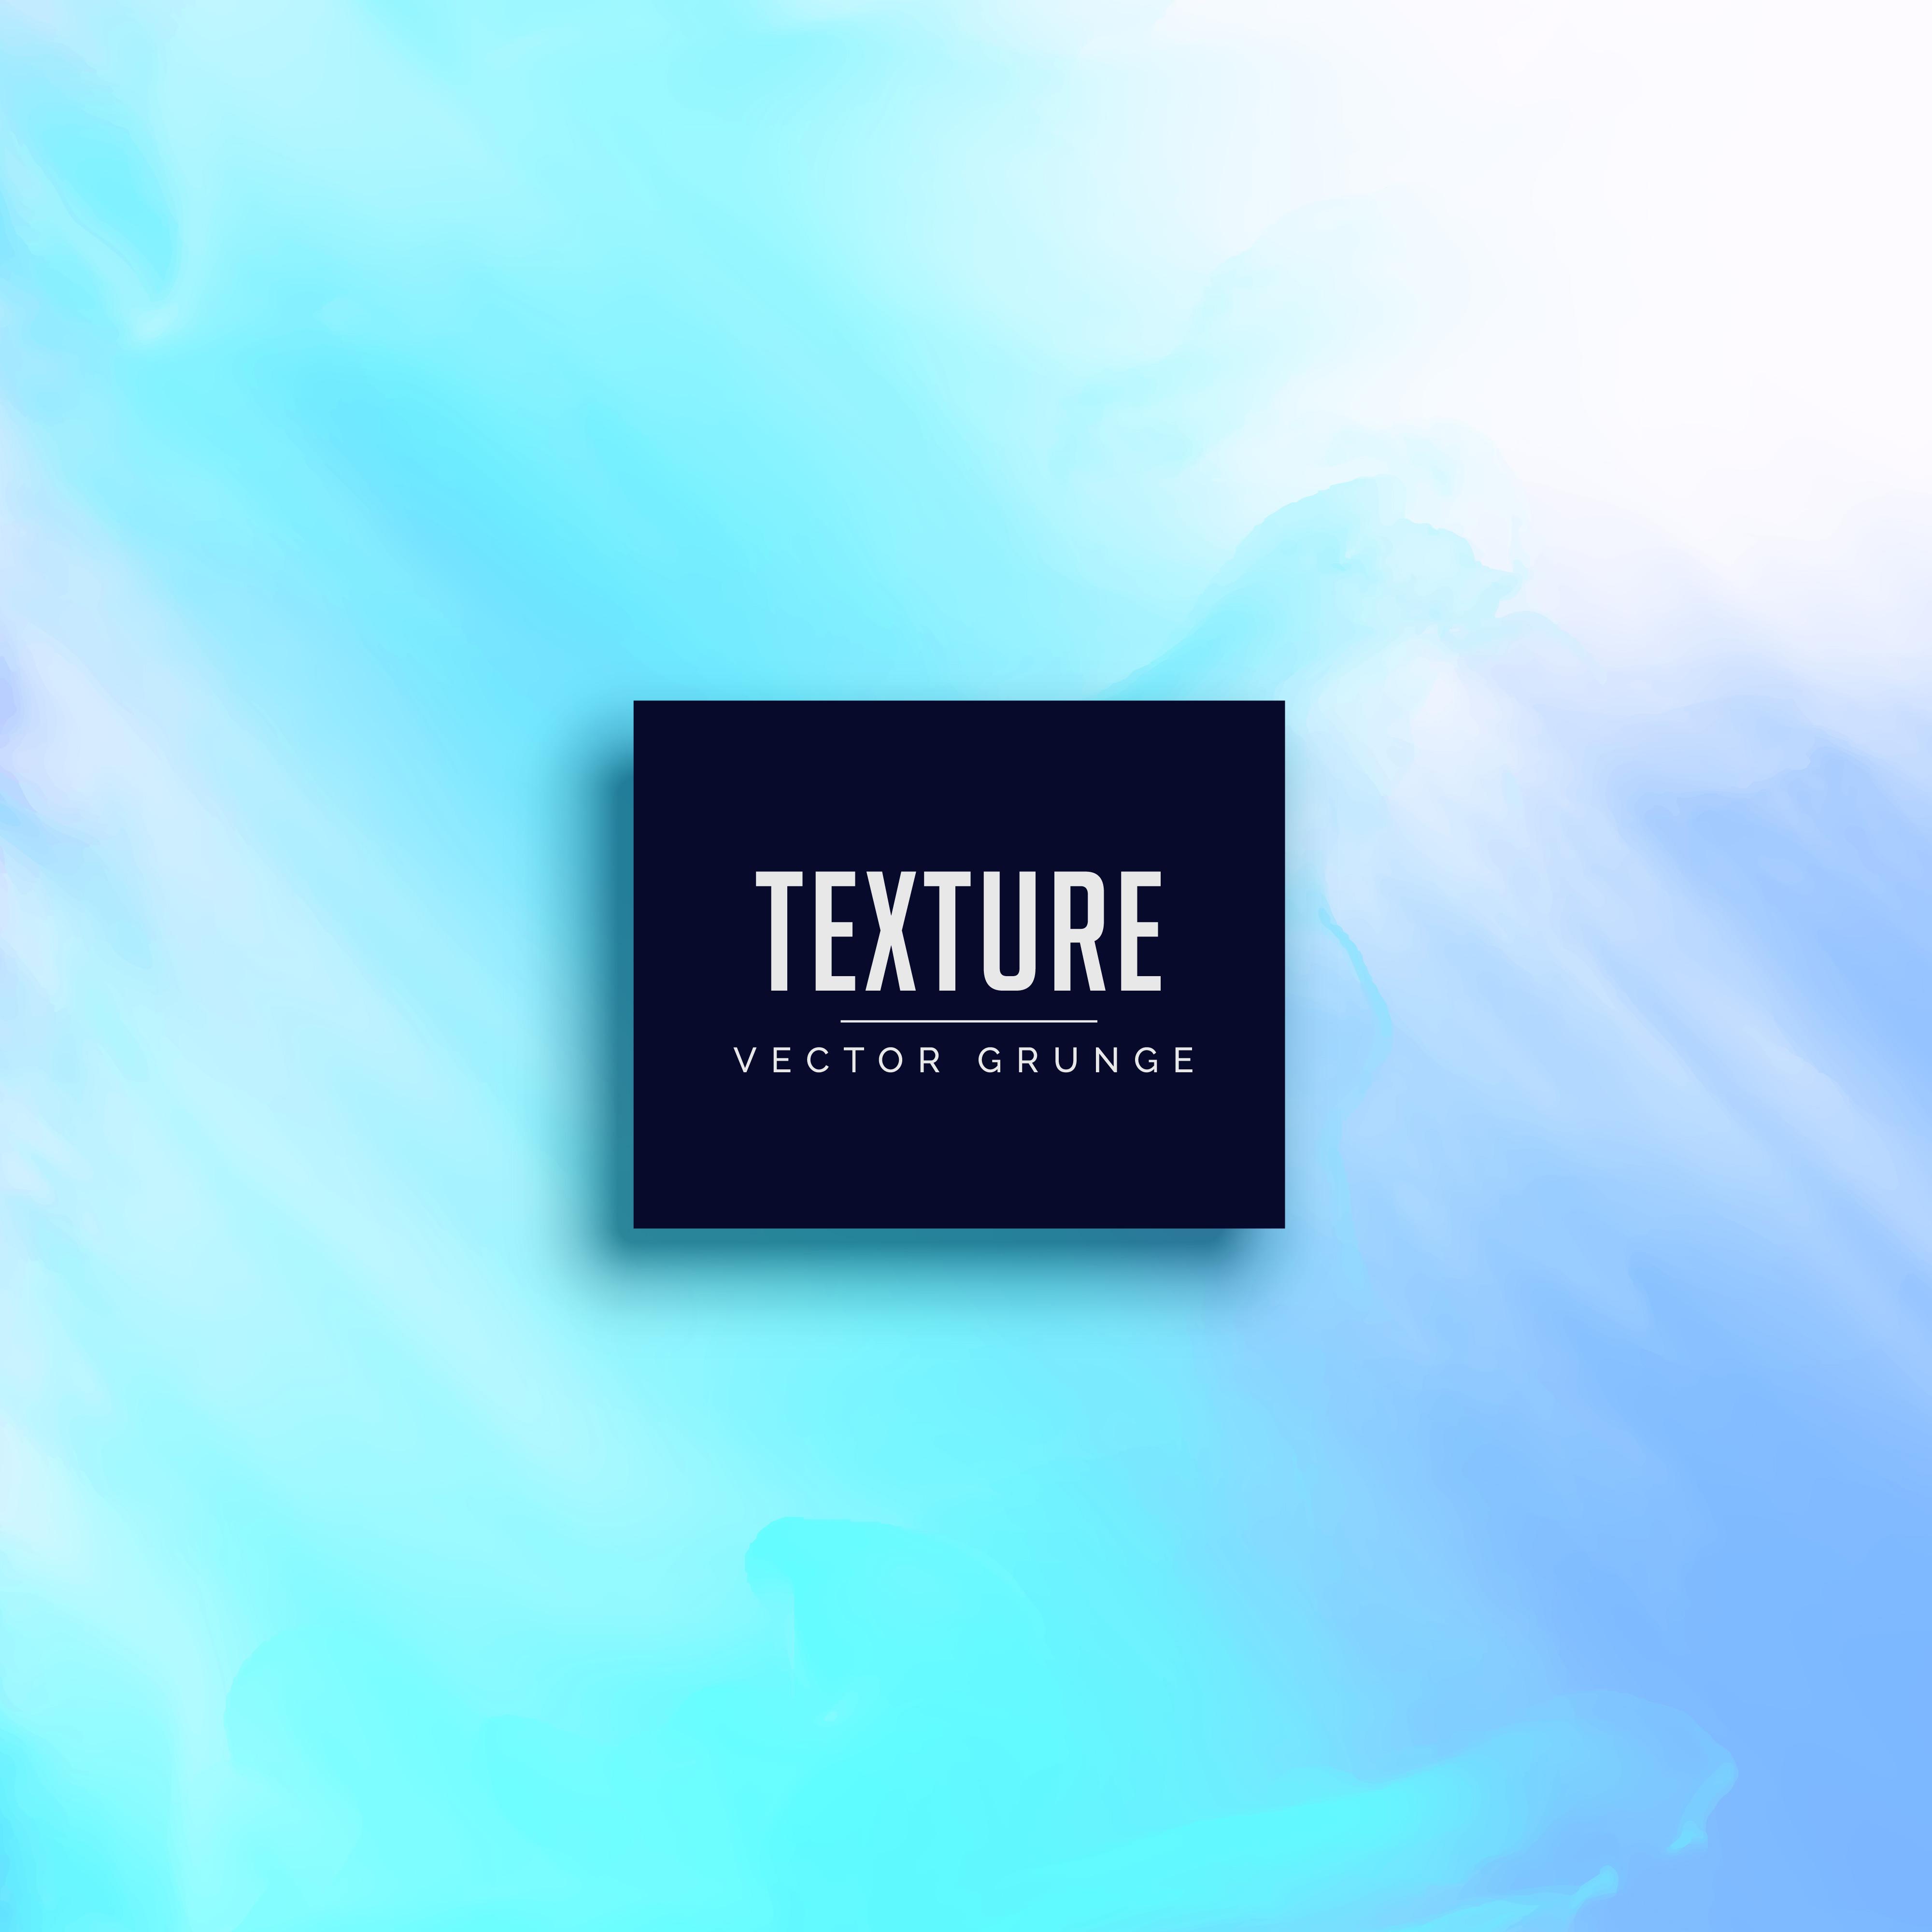 Beautiful Light Blue Bedrooms: Beautiful Light Blue Watercolor Texture Background